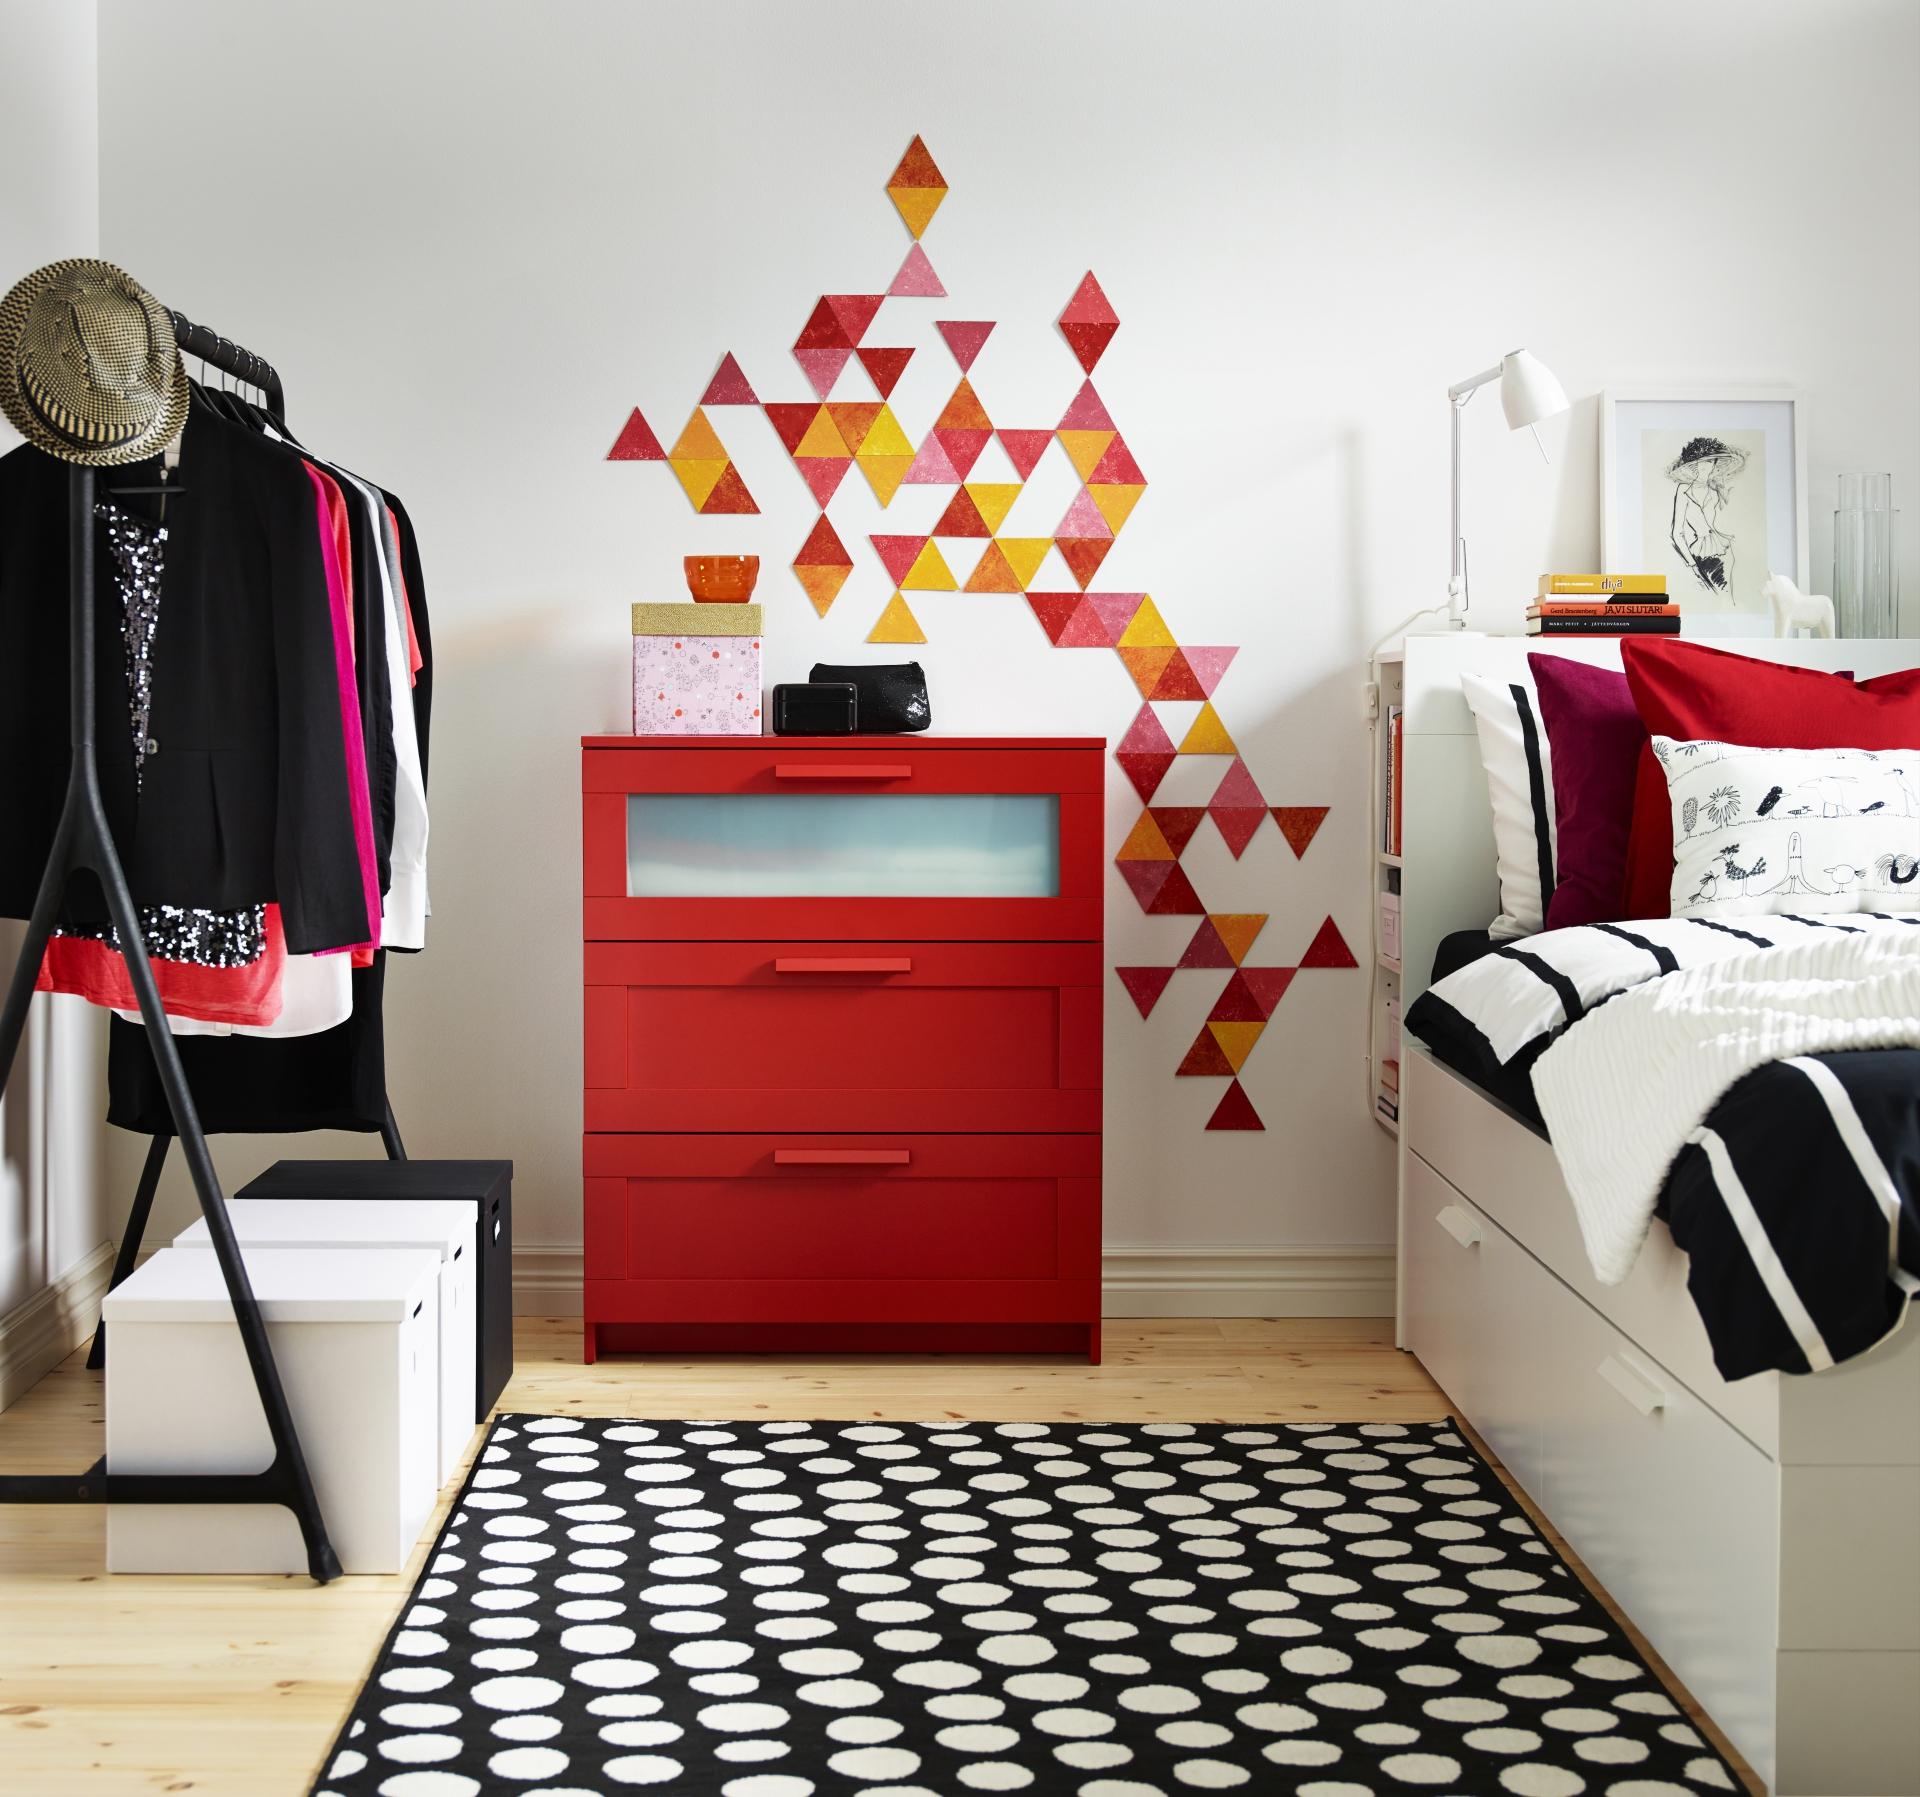 Decorando mi dormitorio peque o for Como decorar un dormitorio matrimonial pequeno